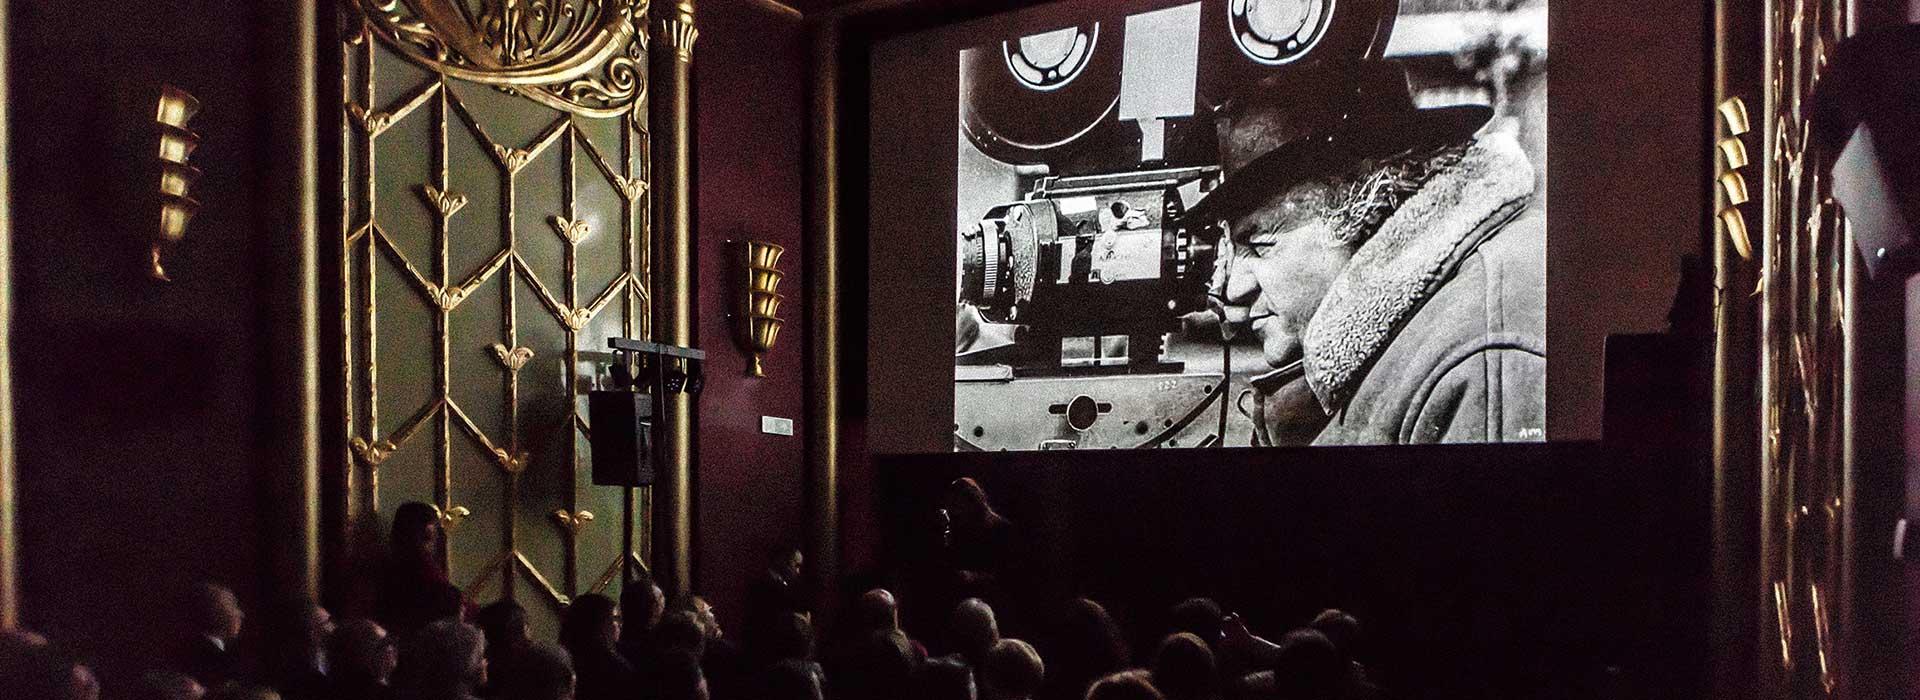 Fulgor Cinema